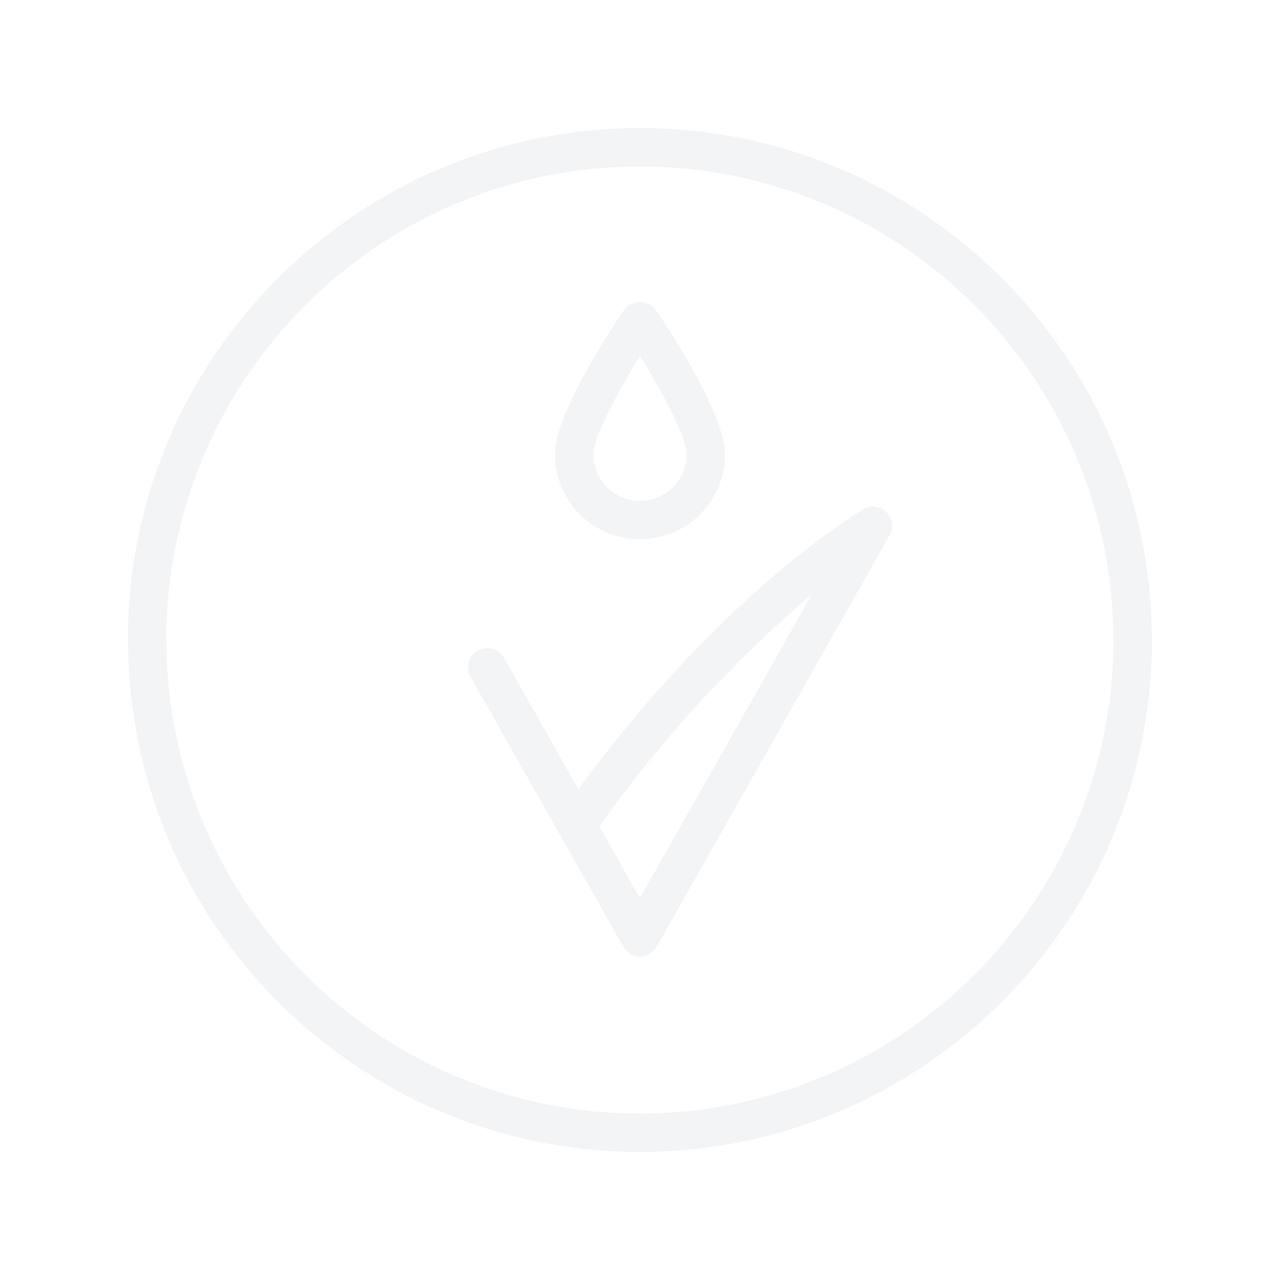 BALMAIN Golden Spa Brush Gift Set